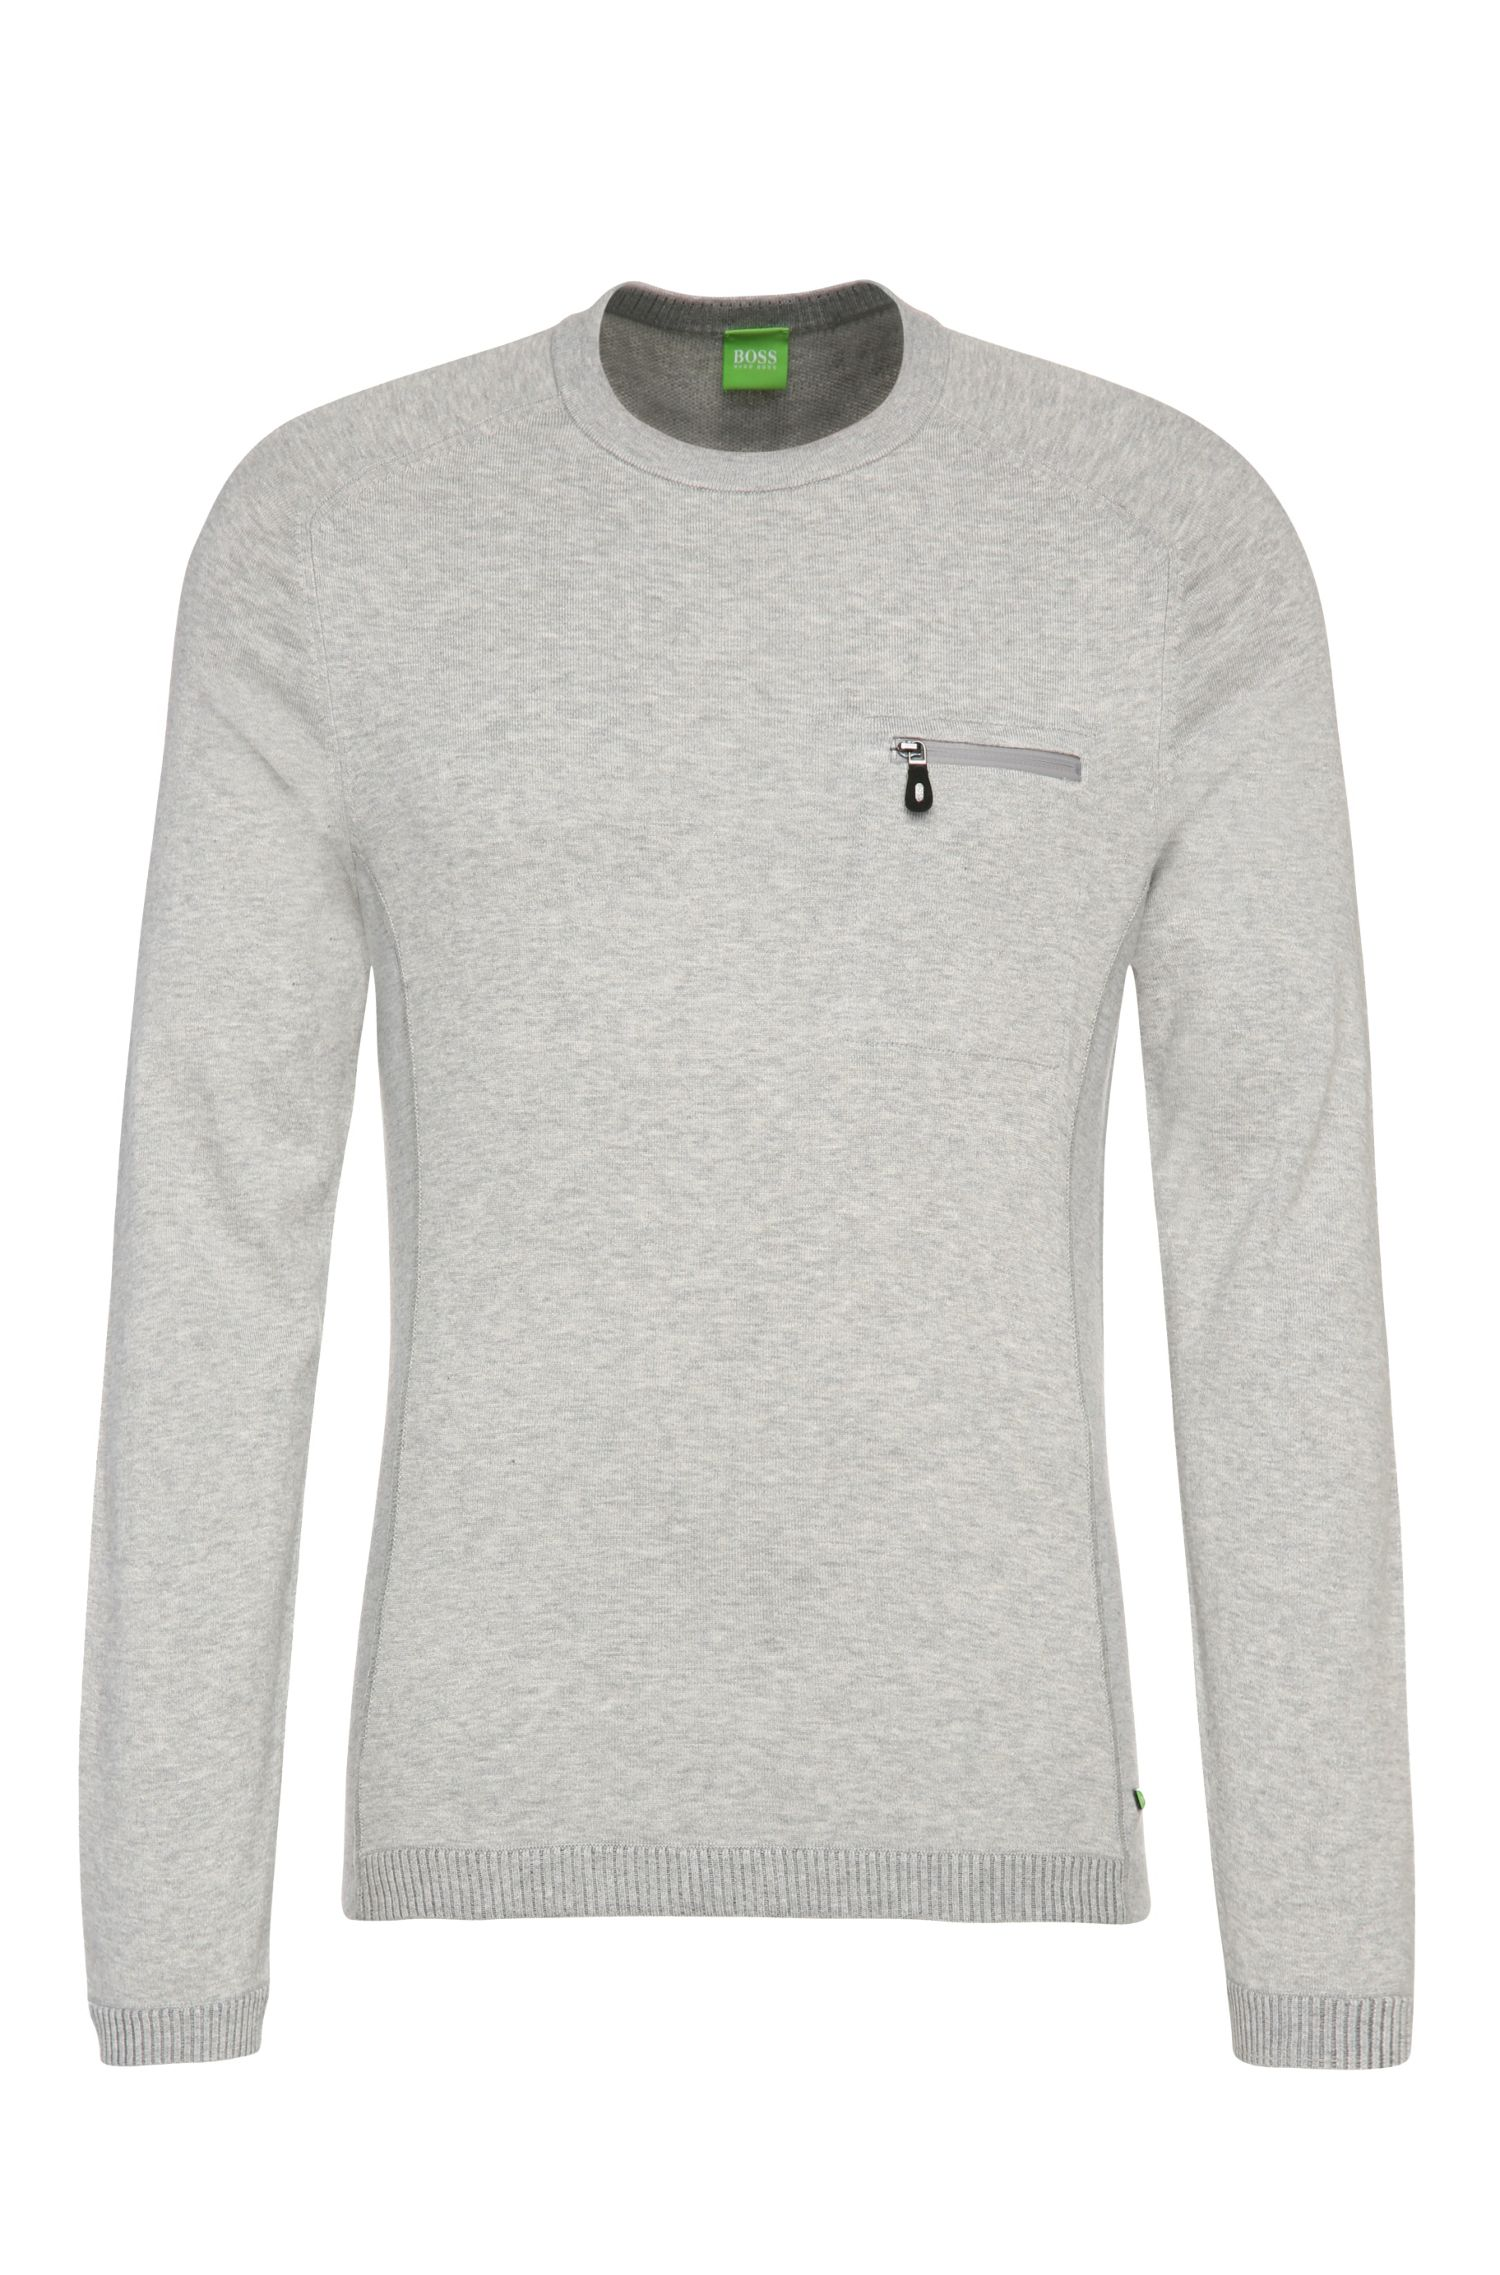 'Riker' | Stretch Cotton Blend Melange Sweater